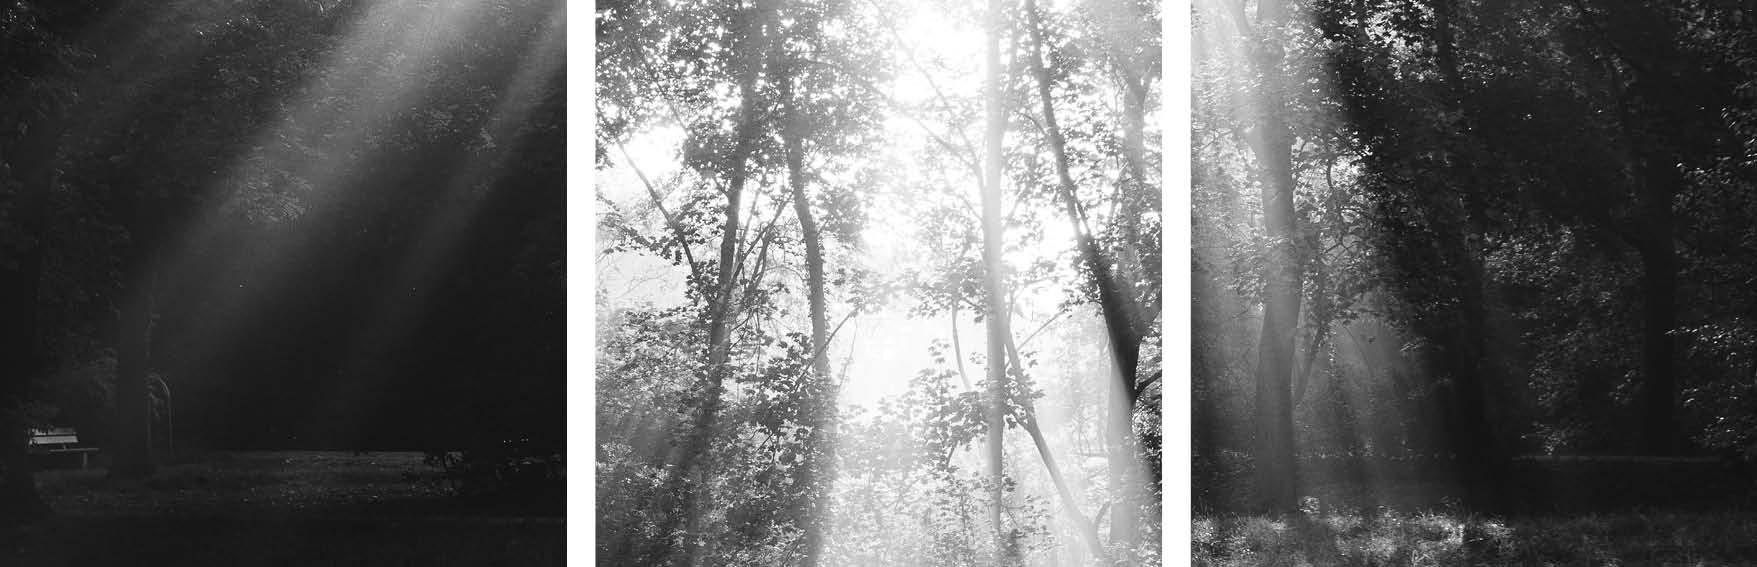 Licht – Roman Pretot, Serien-Nr.: 361-017